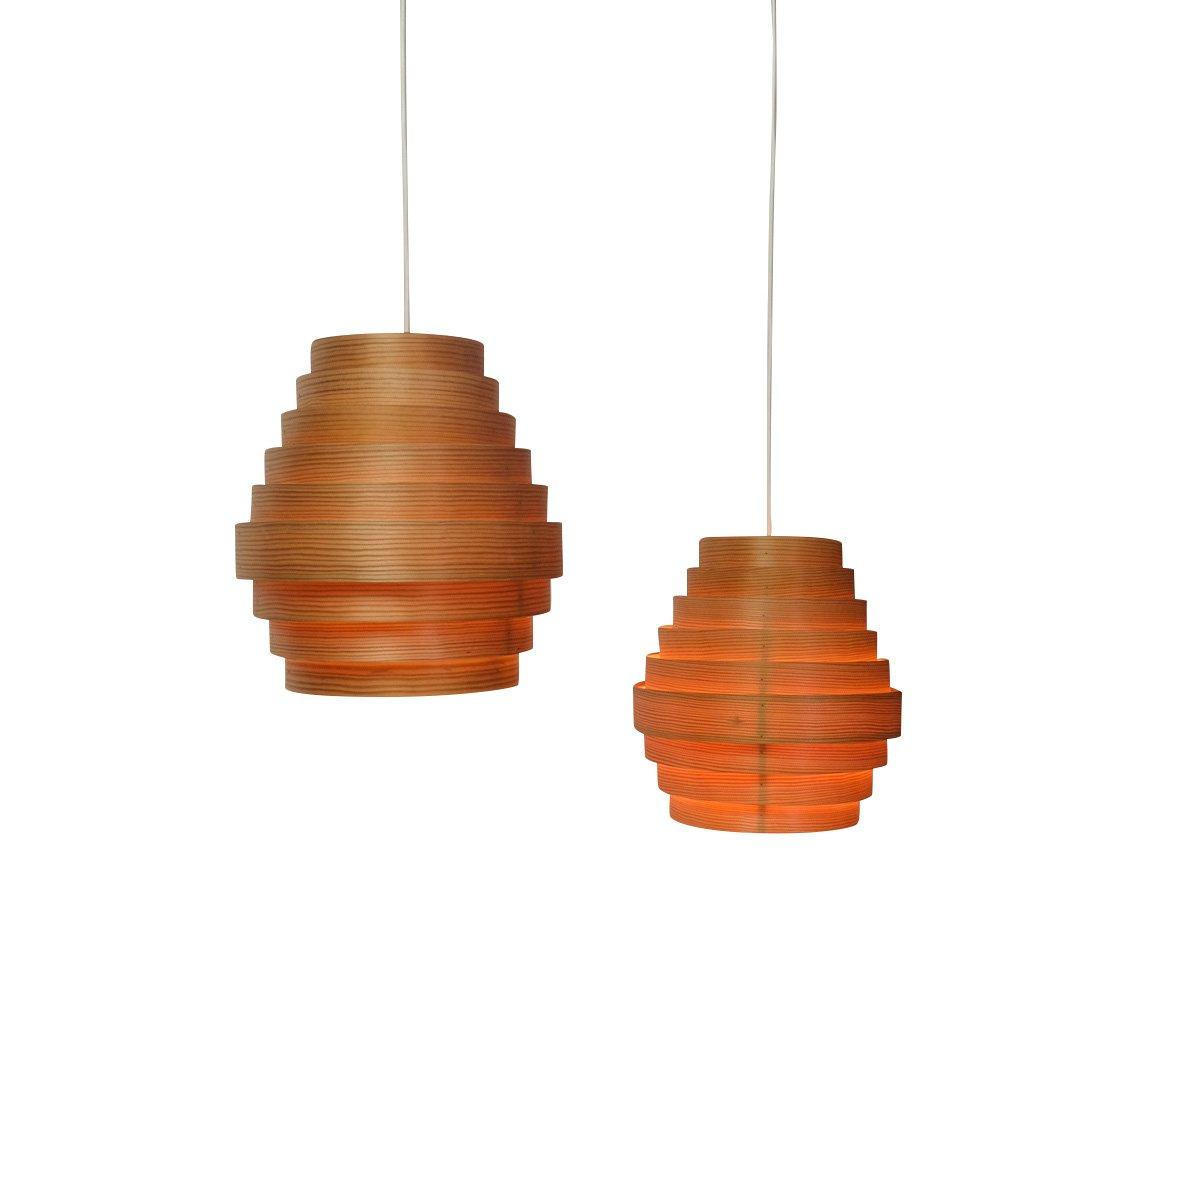 mid century pendant lighting. Mid-Century Pendant Lamps By Hans-Agne Jakobsson For Markaryd, 1950s, Set Of 2 Mid Century Lighting B